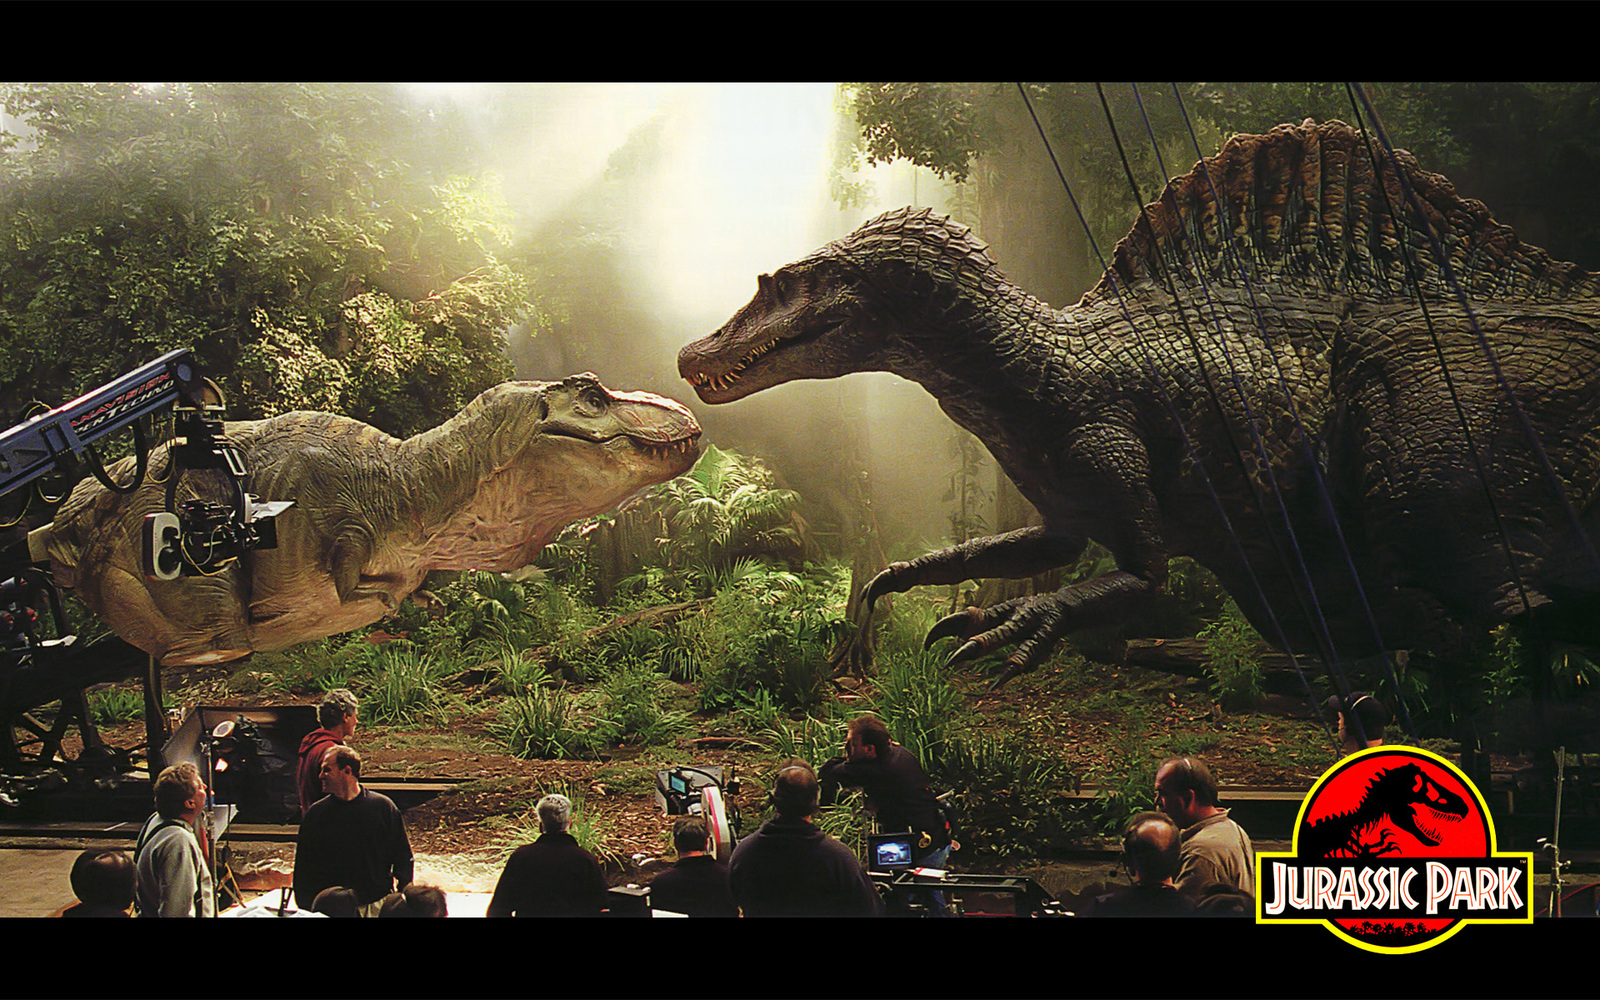 Spinosaurus animatronic jurassic pedia - Spinosaurus jurassic park ...